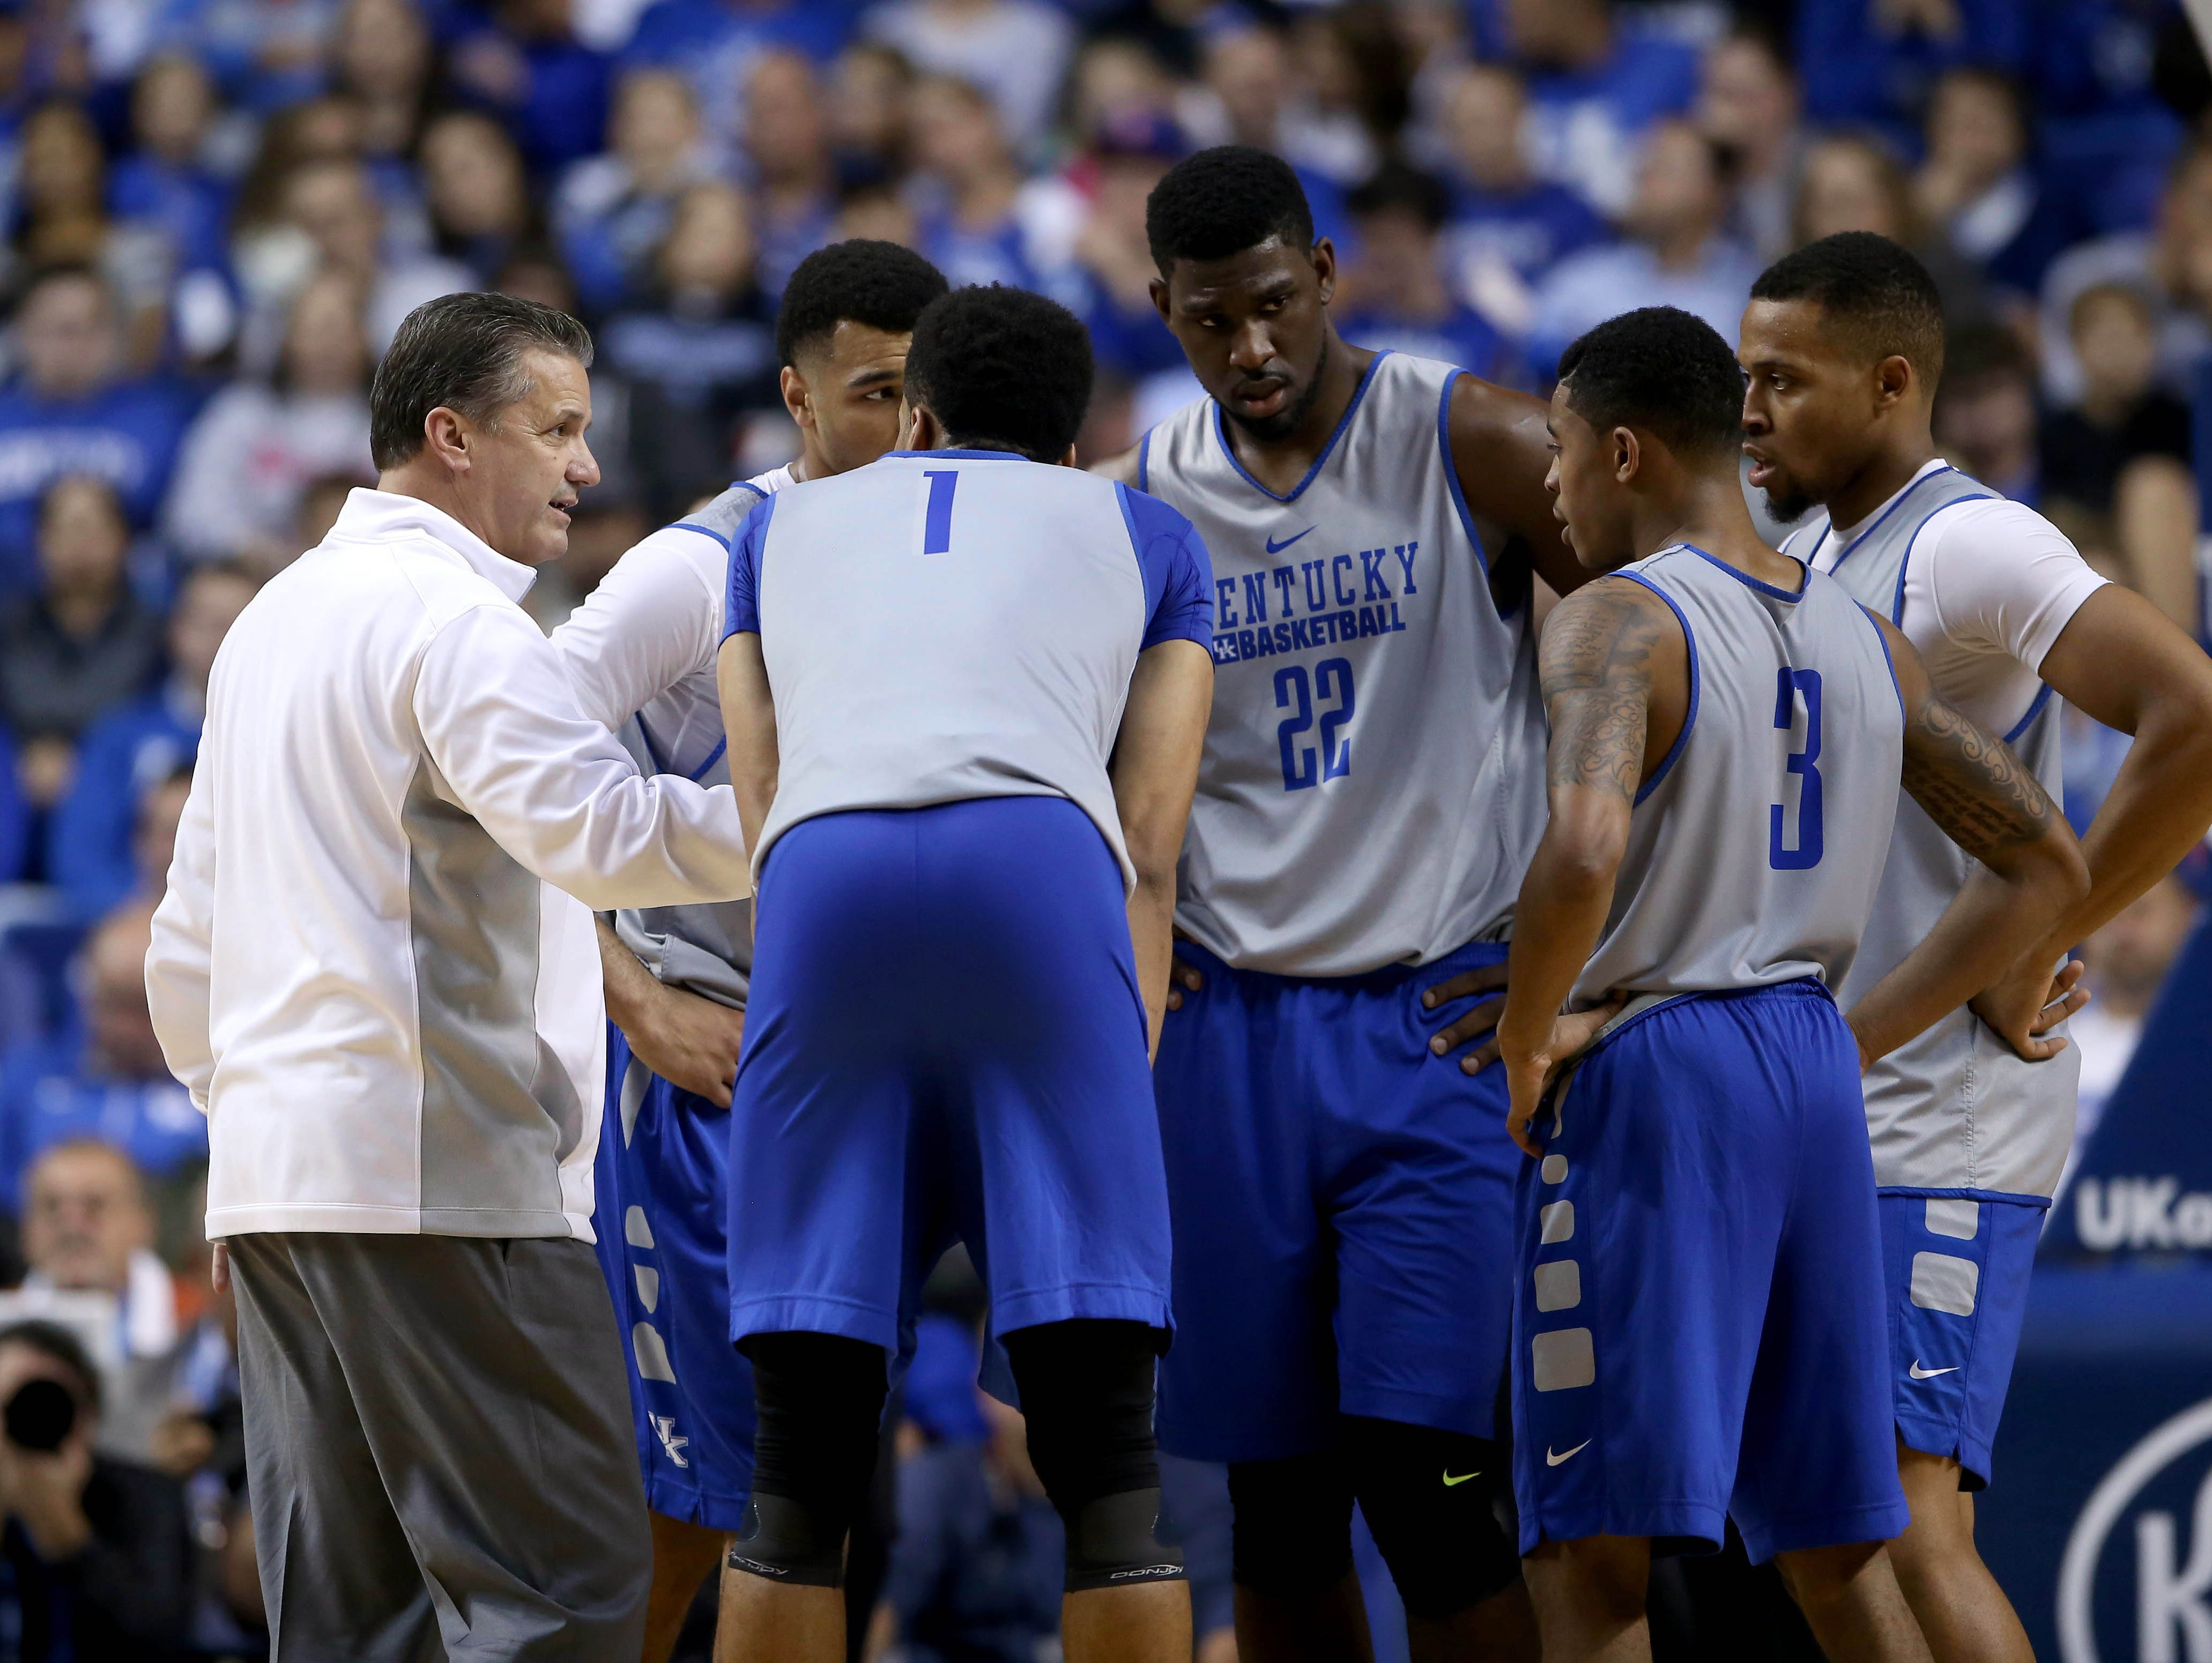 Oct 27, 2015; Lexington, Kentucky, USA; Kentucky Wildcats head coach John Calipari coaches his team in the second half of the Blue White scrimmage at Rupp Arena.